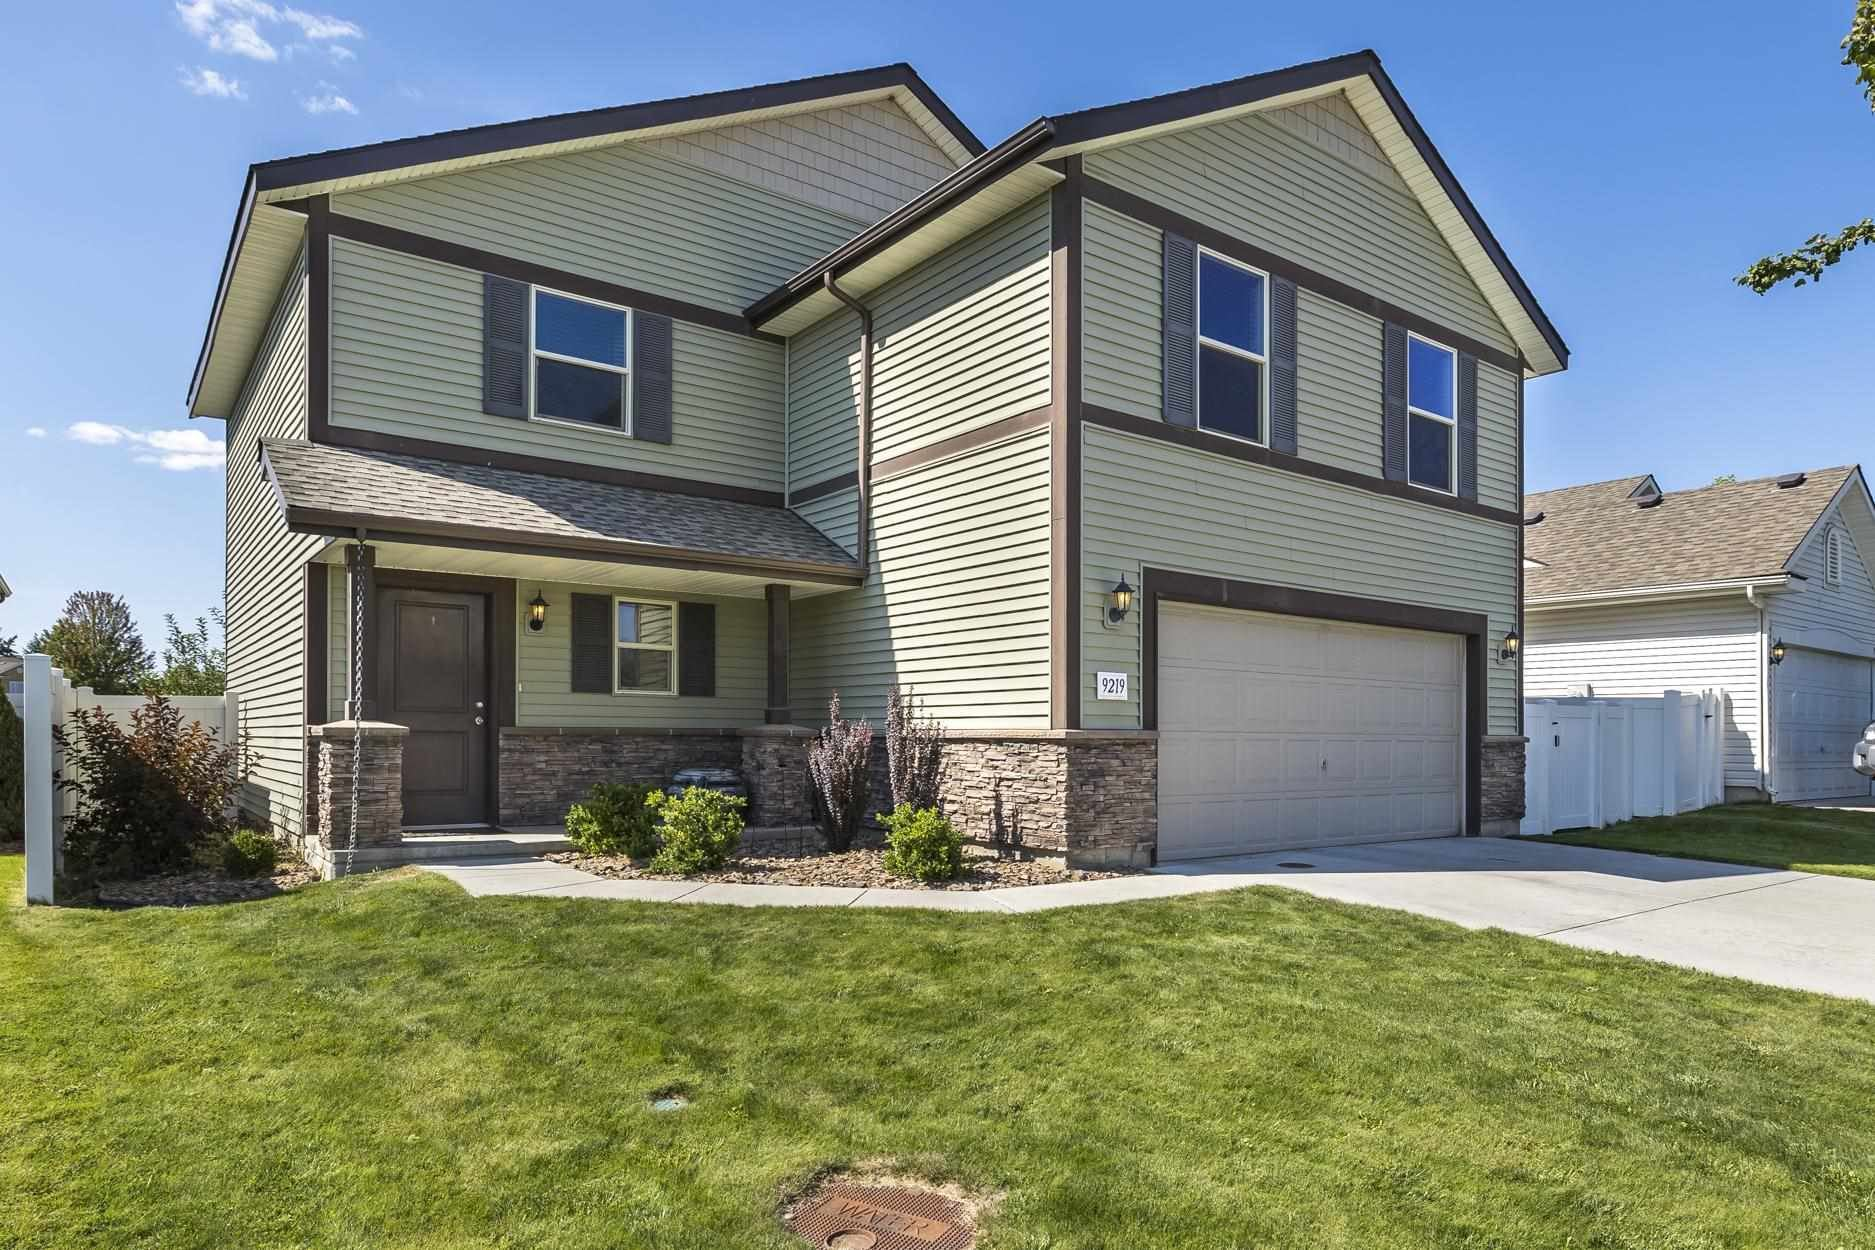 9219 N Elm St, Spokane, WA 99208 - #: 202124306